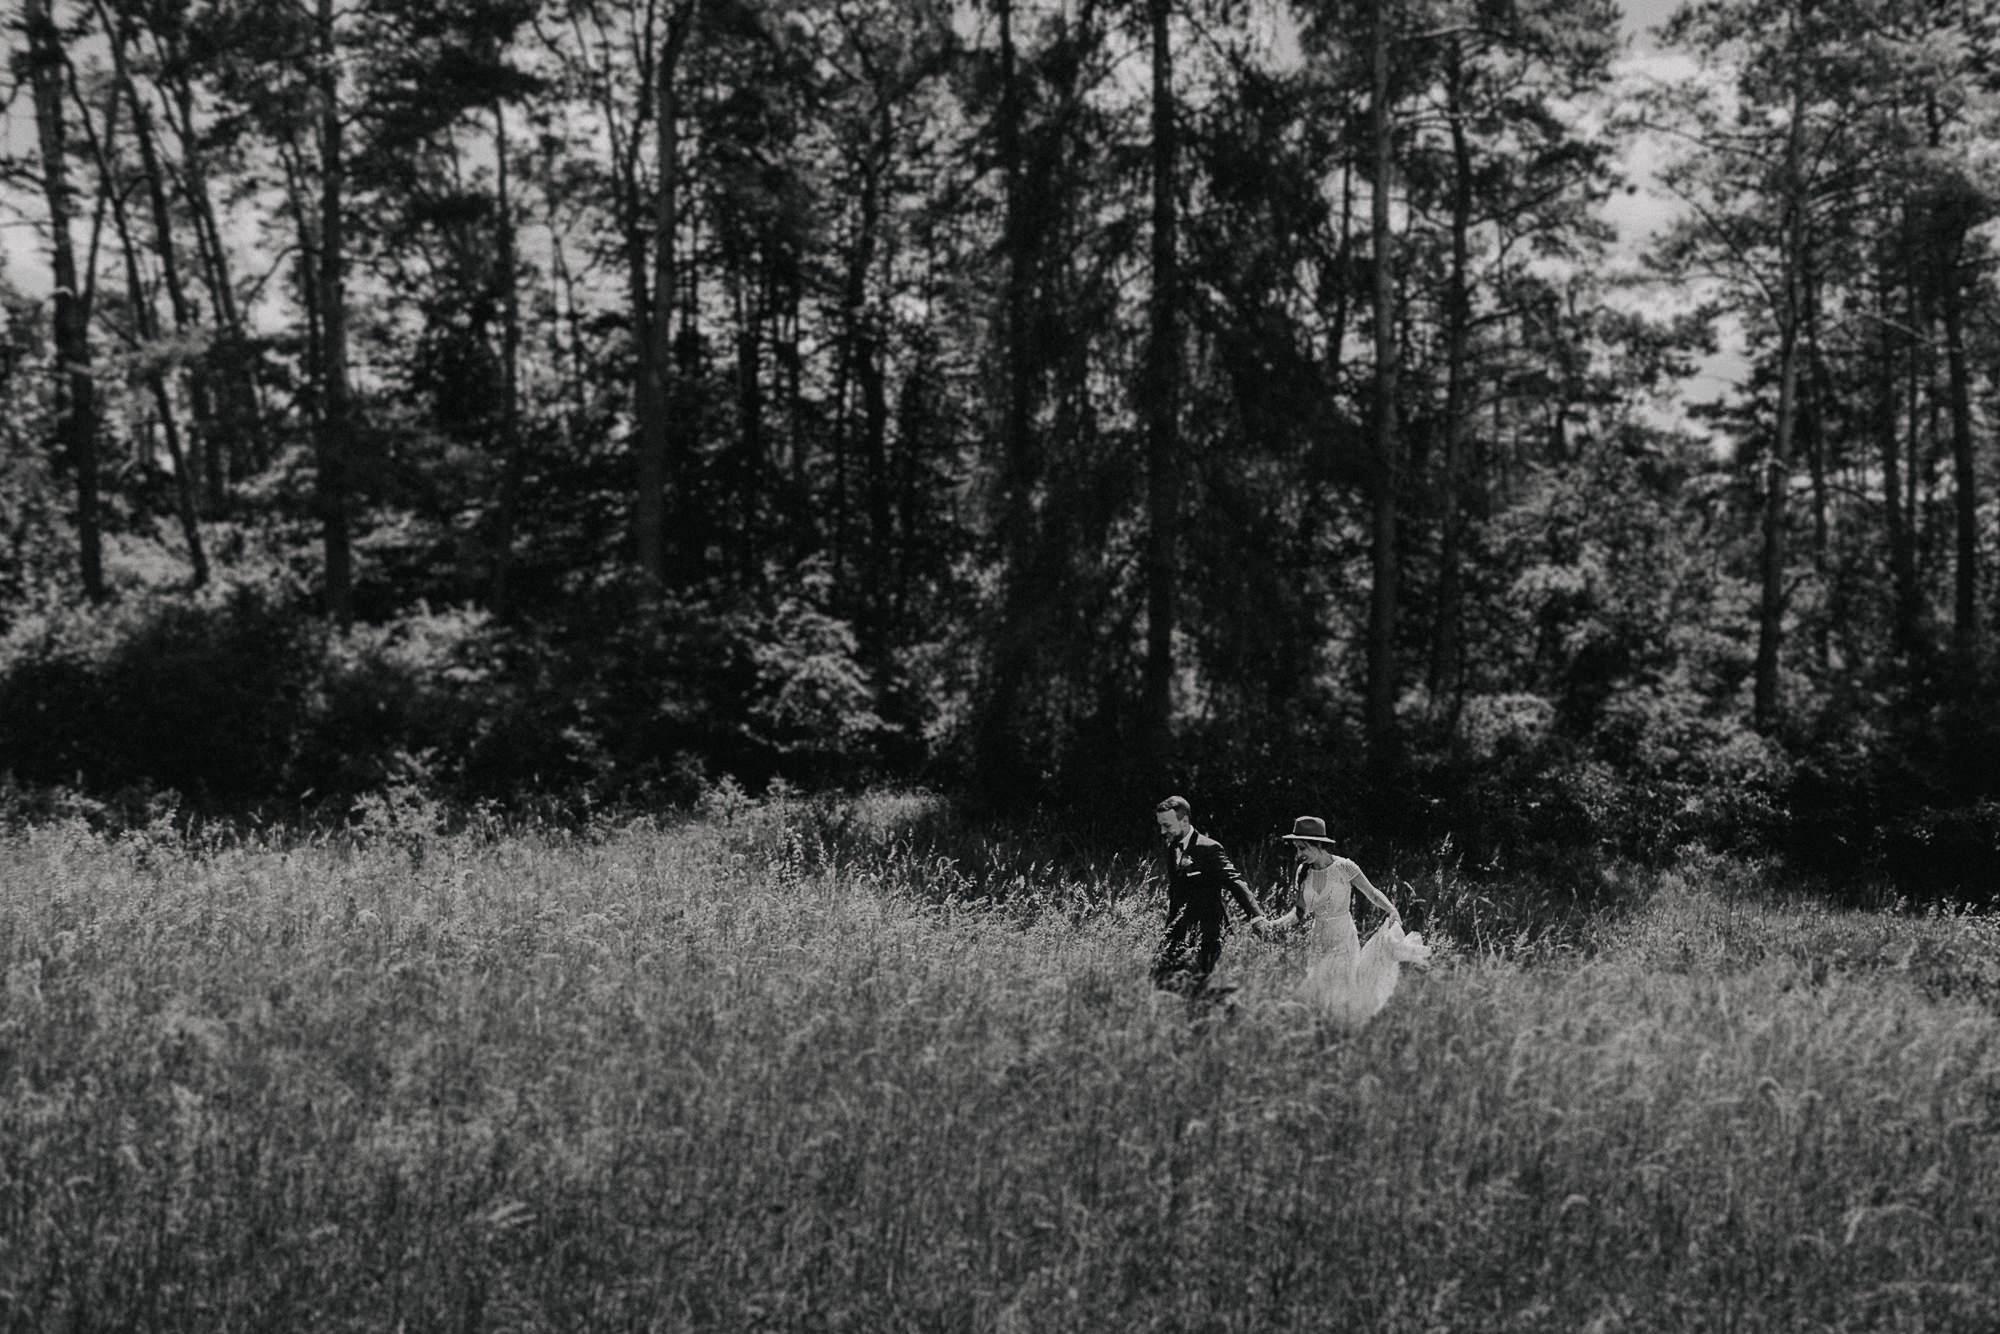 Hochzeitsfotograf-Potsdam-Tom-und-Lia-Fotografie-5DT_7088